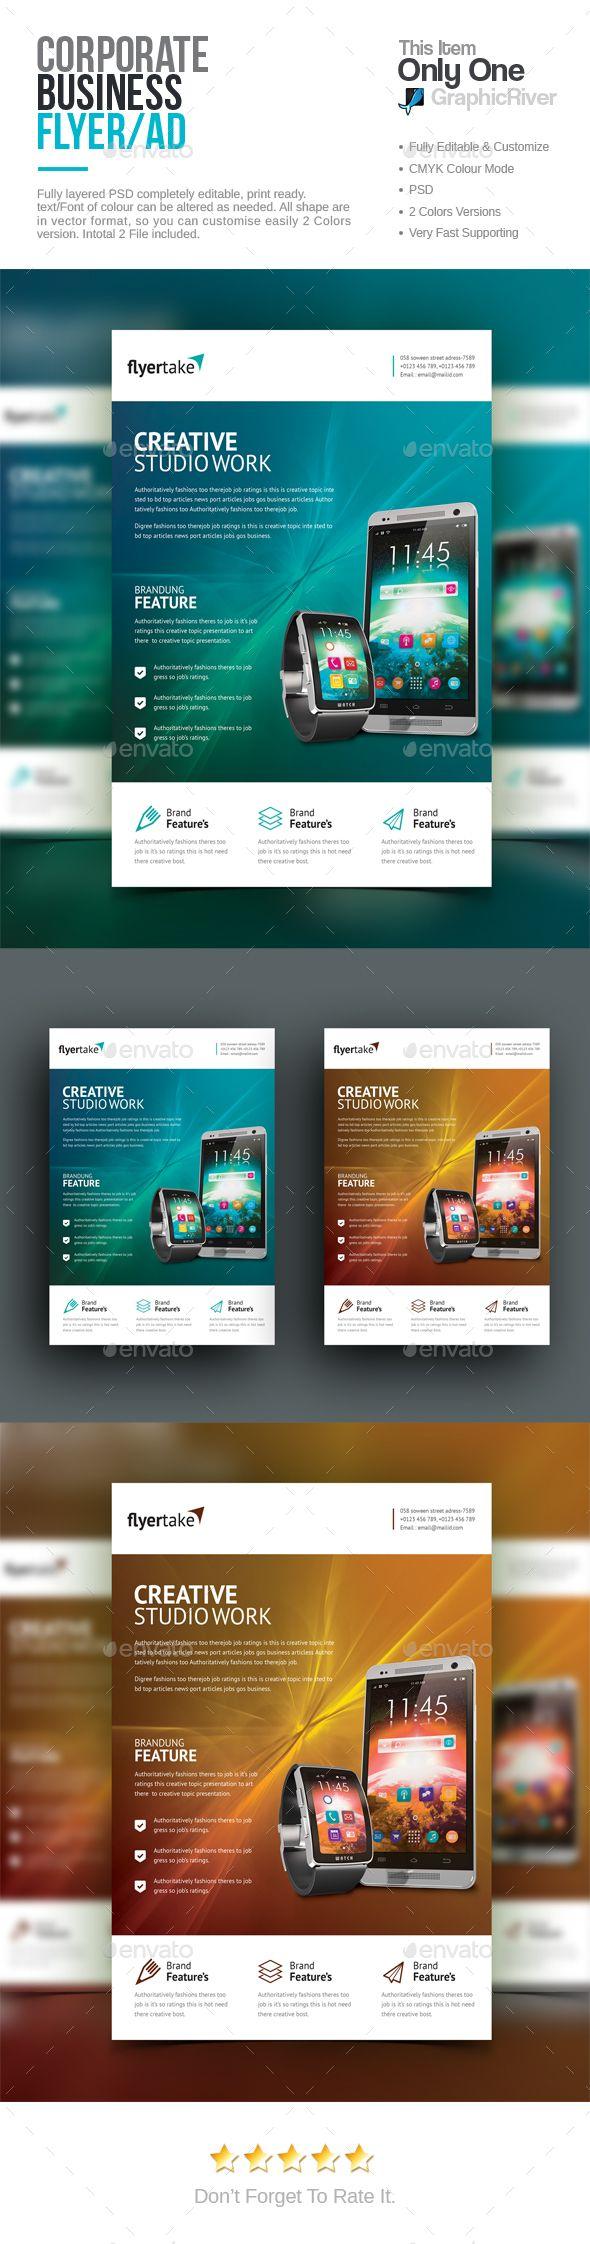 Corporate Flyer Design - Corporate Flyer Template PSD. Download here: https://graphicriver.net/item/corporate-flyer/16952087?s_rank=12&ref=yinkira